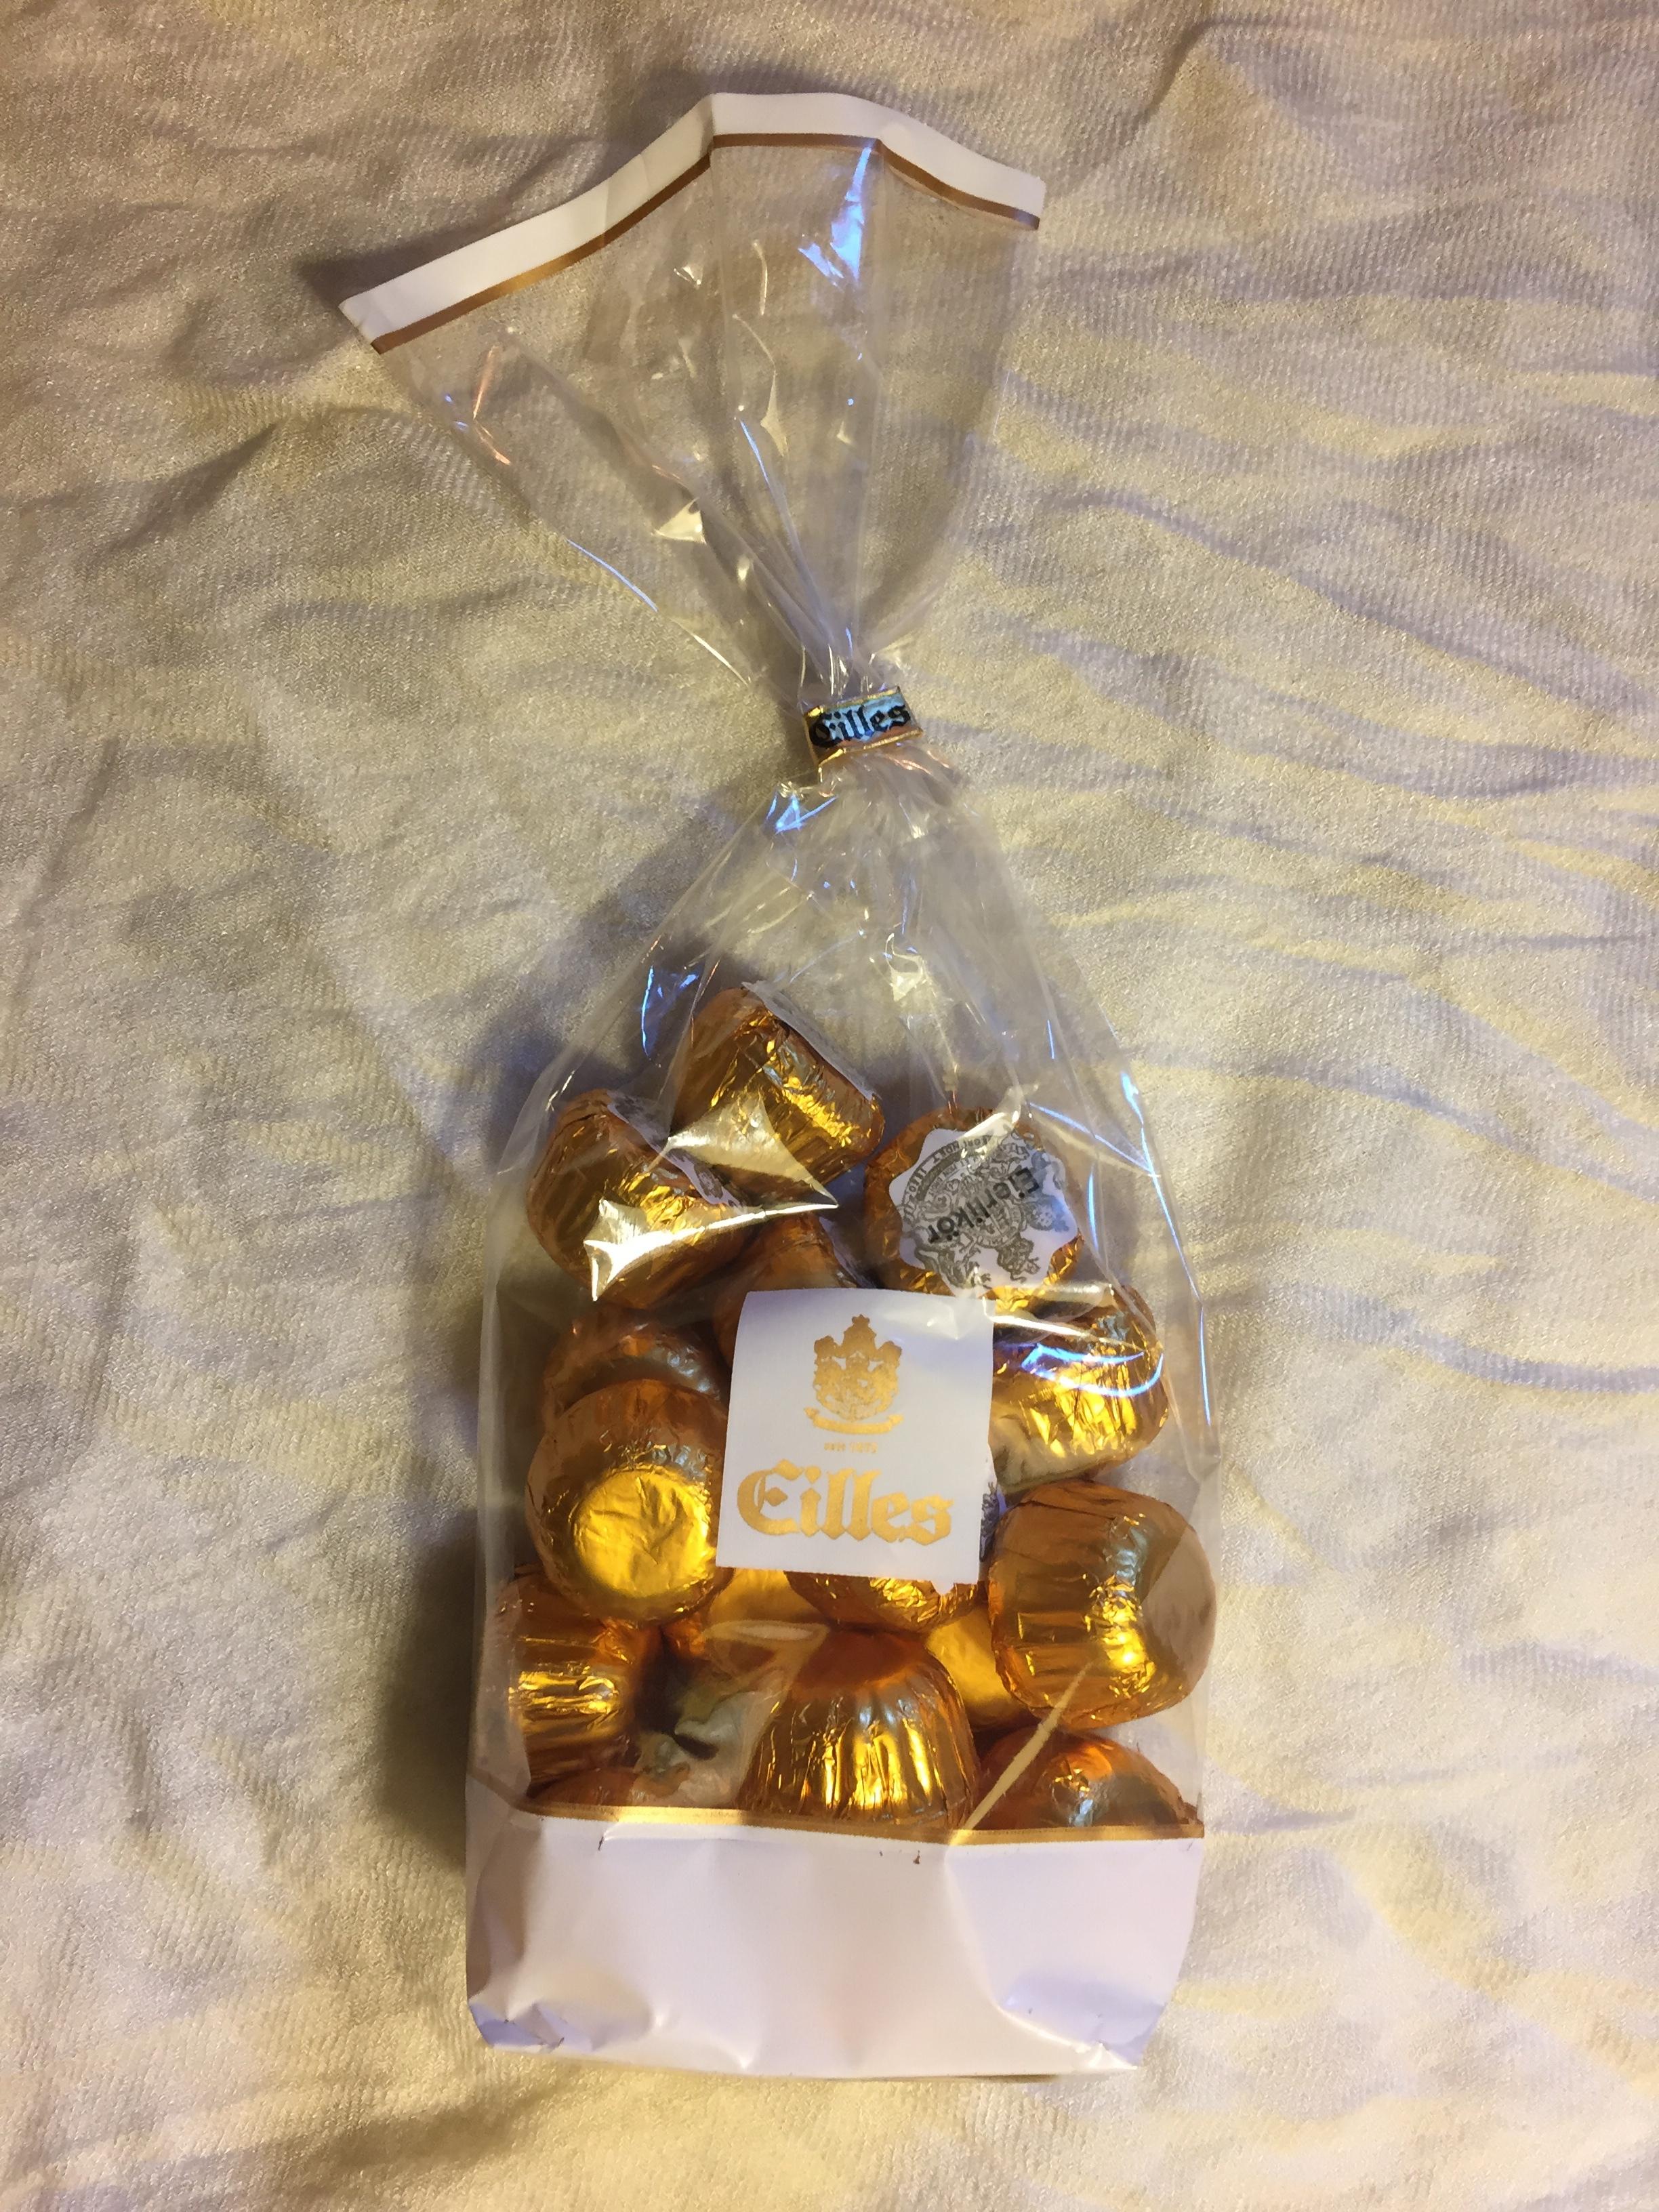 eggnog-filled chocolates